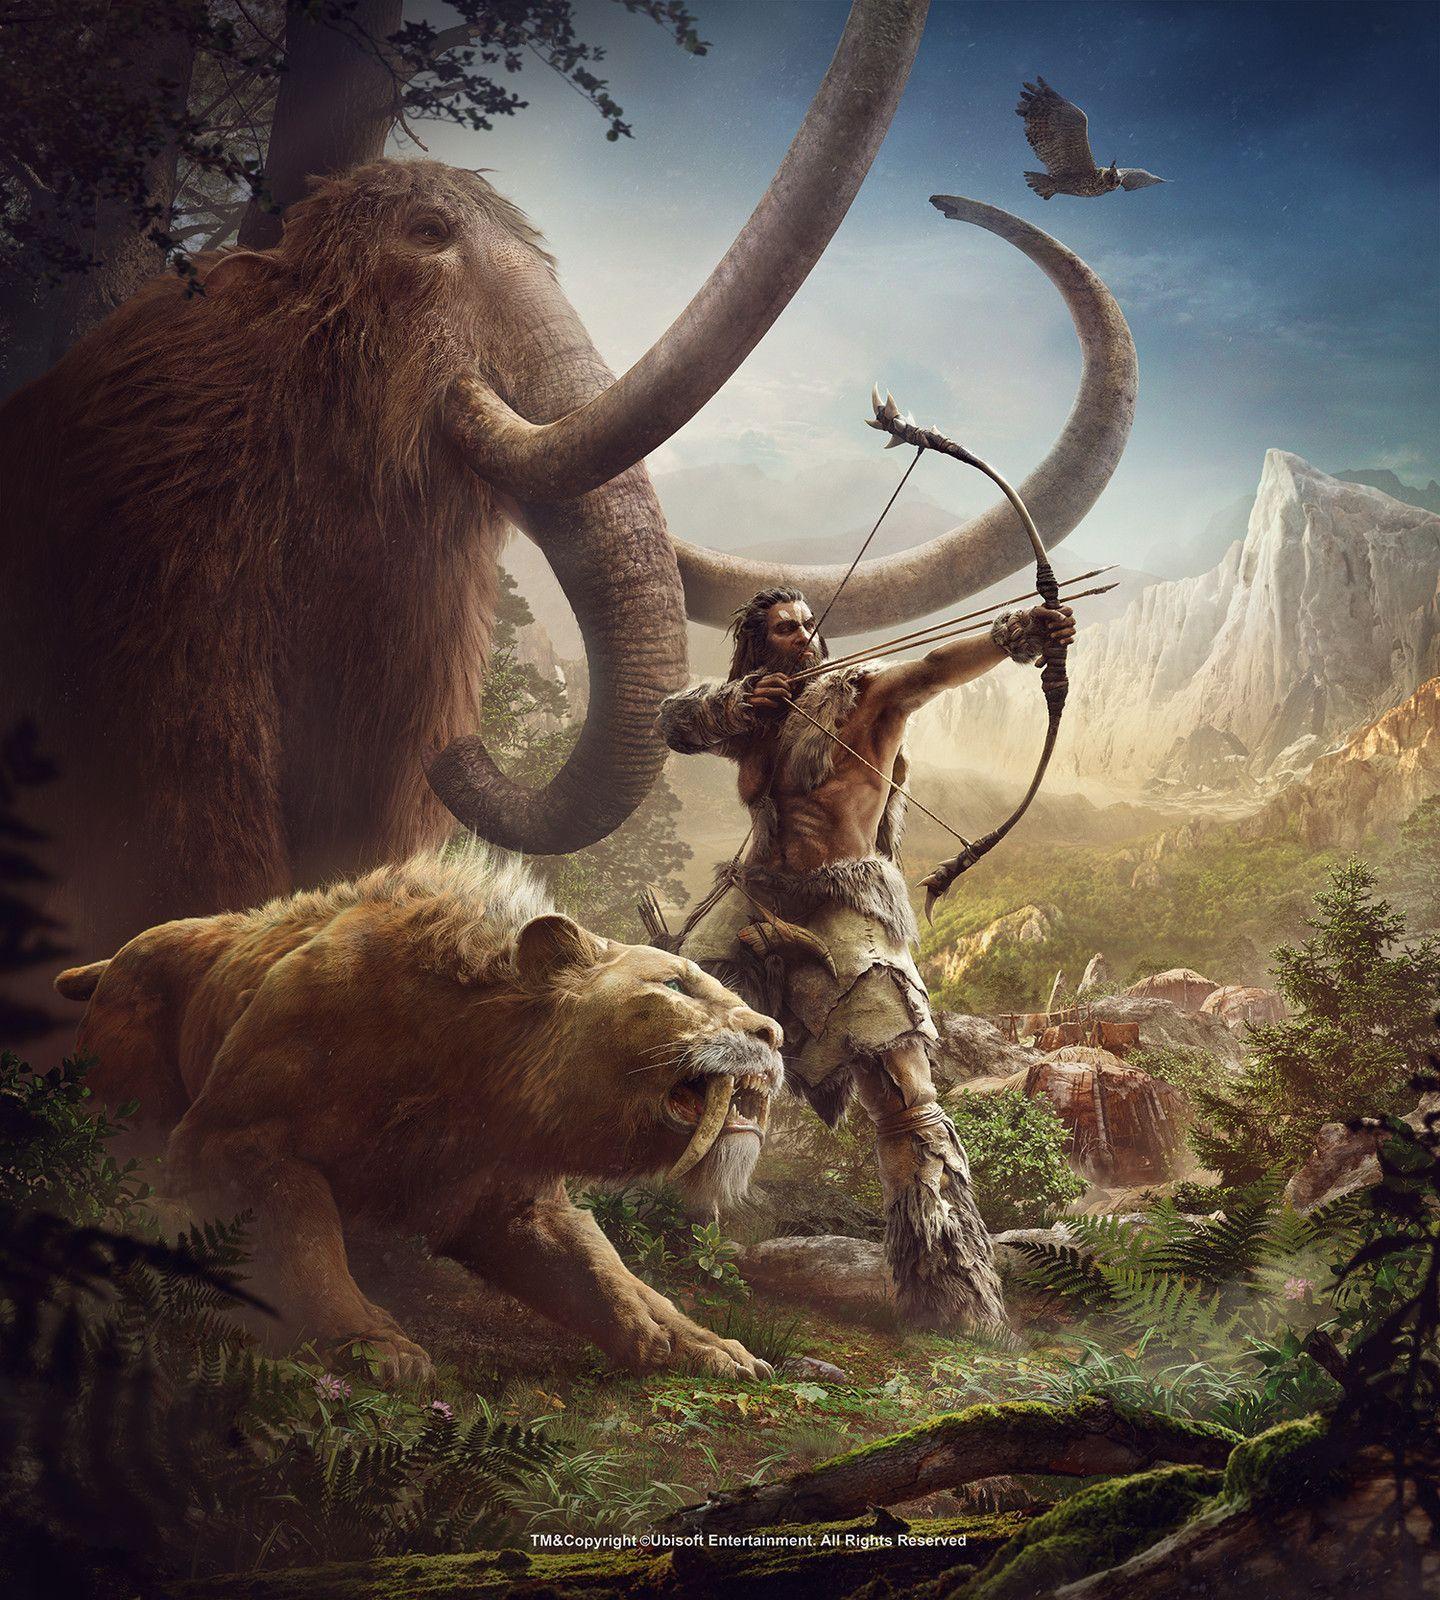 Beast Master Far Cry Primal, Eve Berthelette on